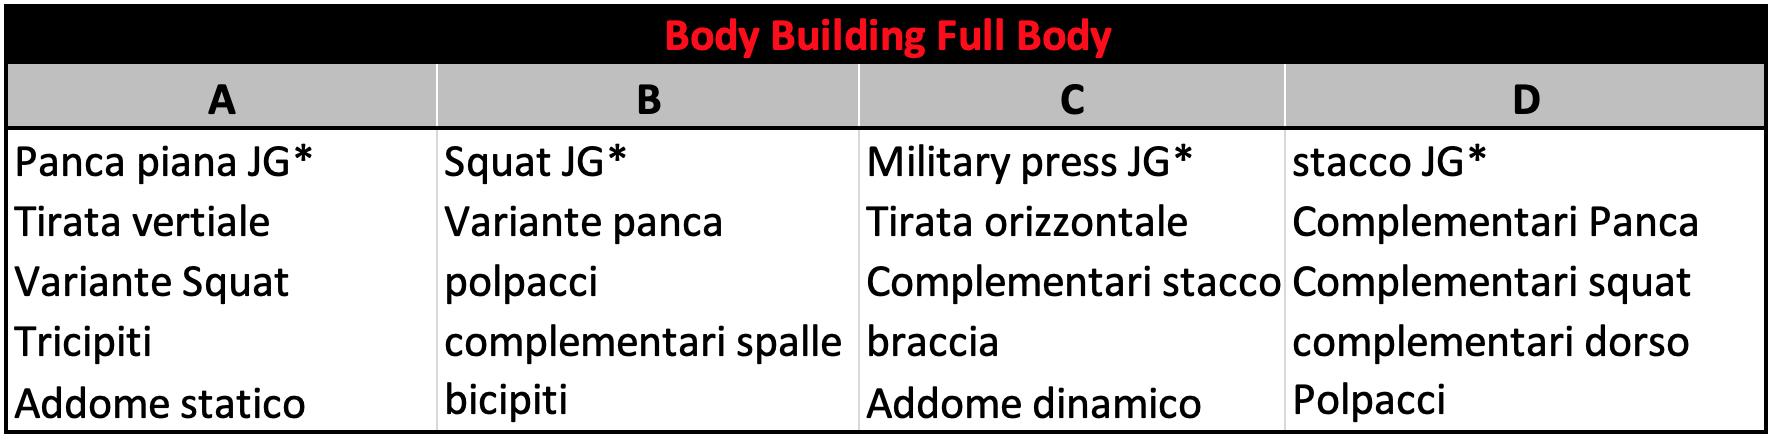 Body Building Full Body